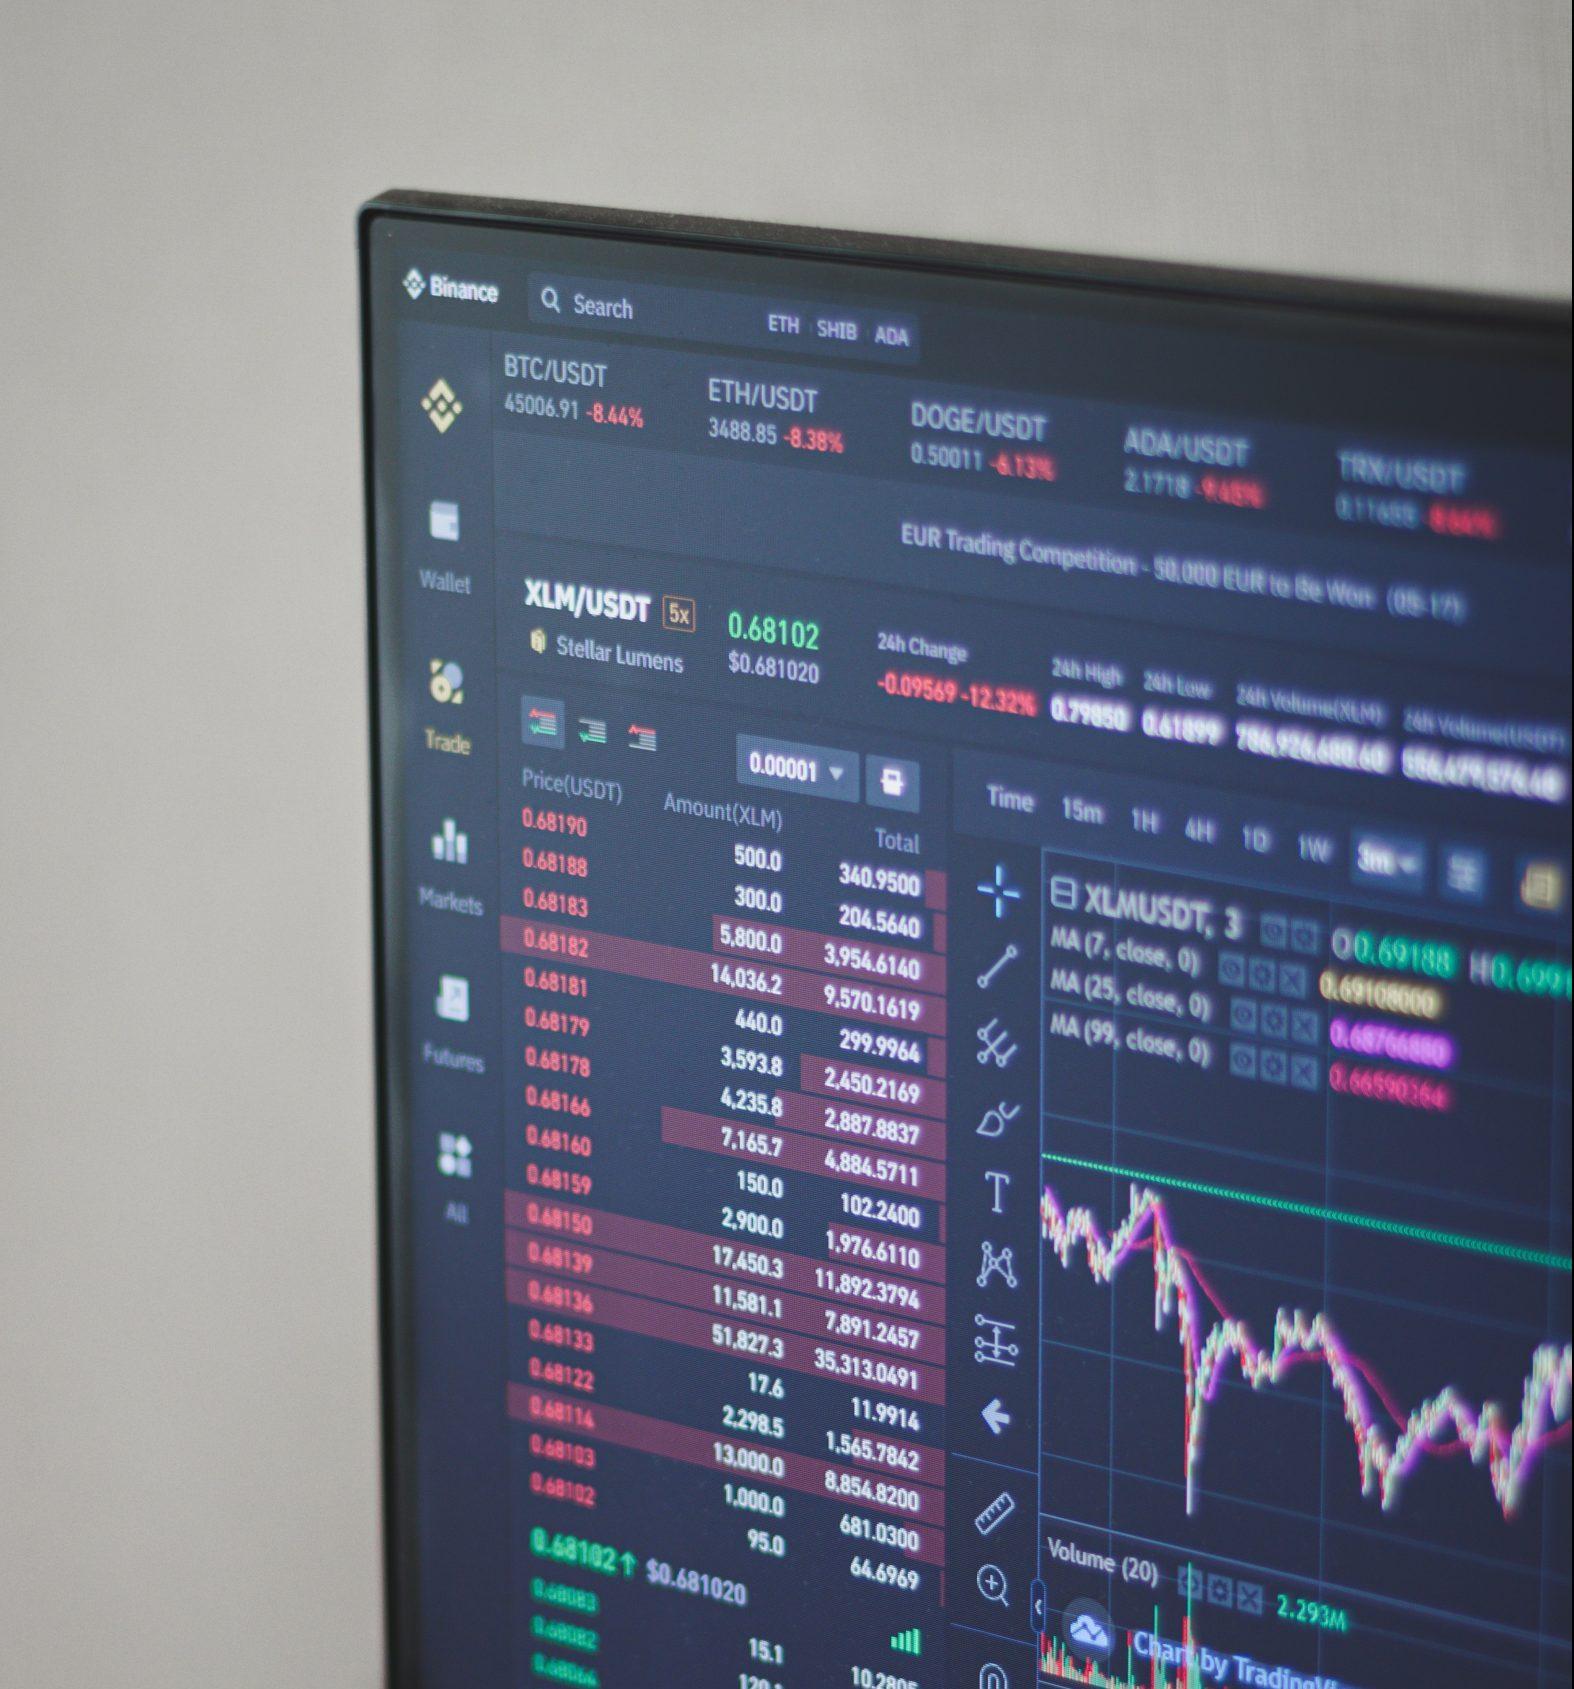 nft marketplace on screen